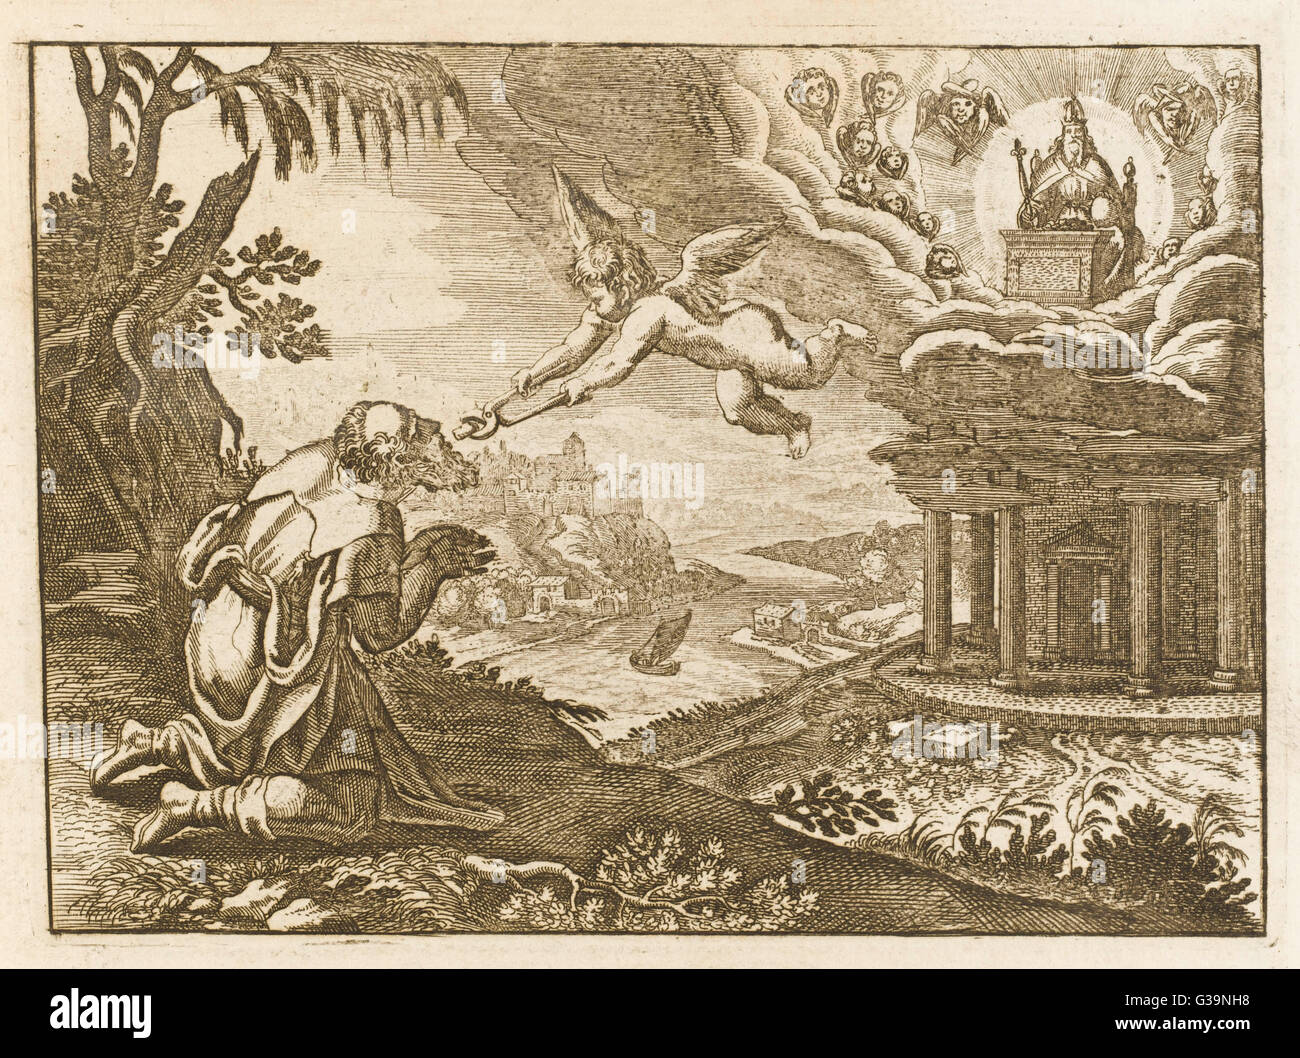 Seraphim Stock Photos & Seraphim Stock Images - Alamy